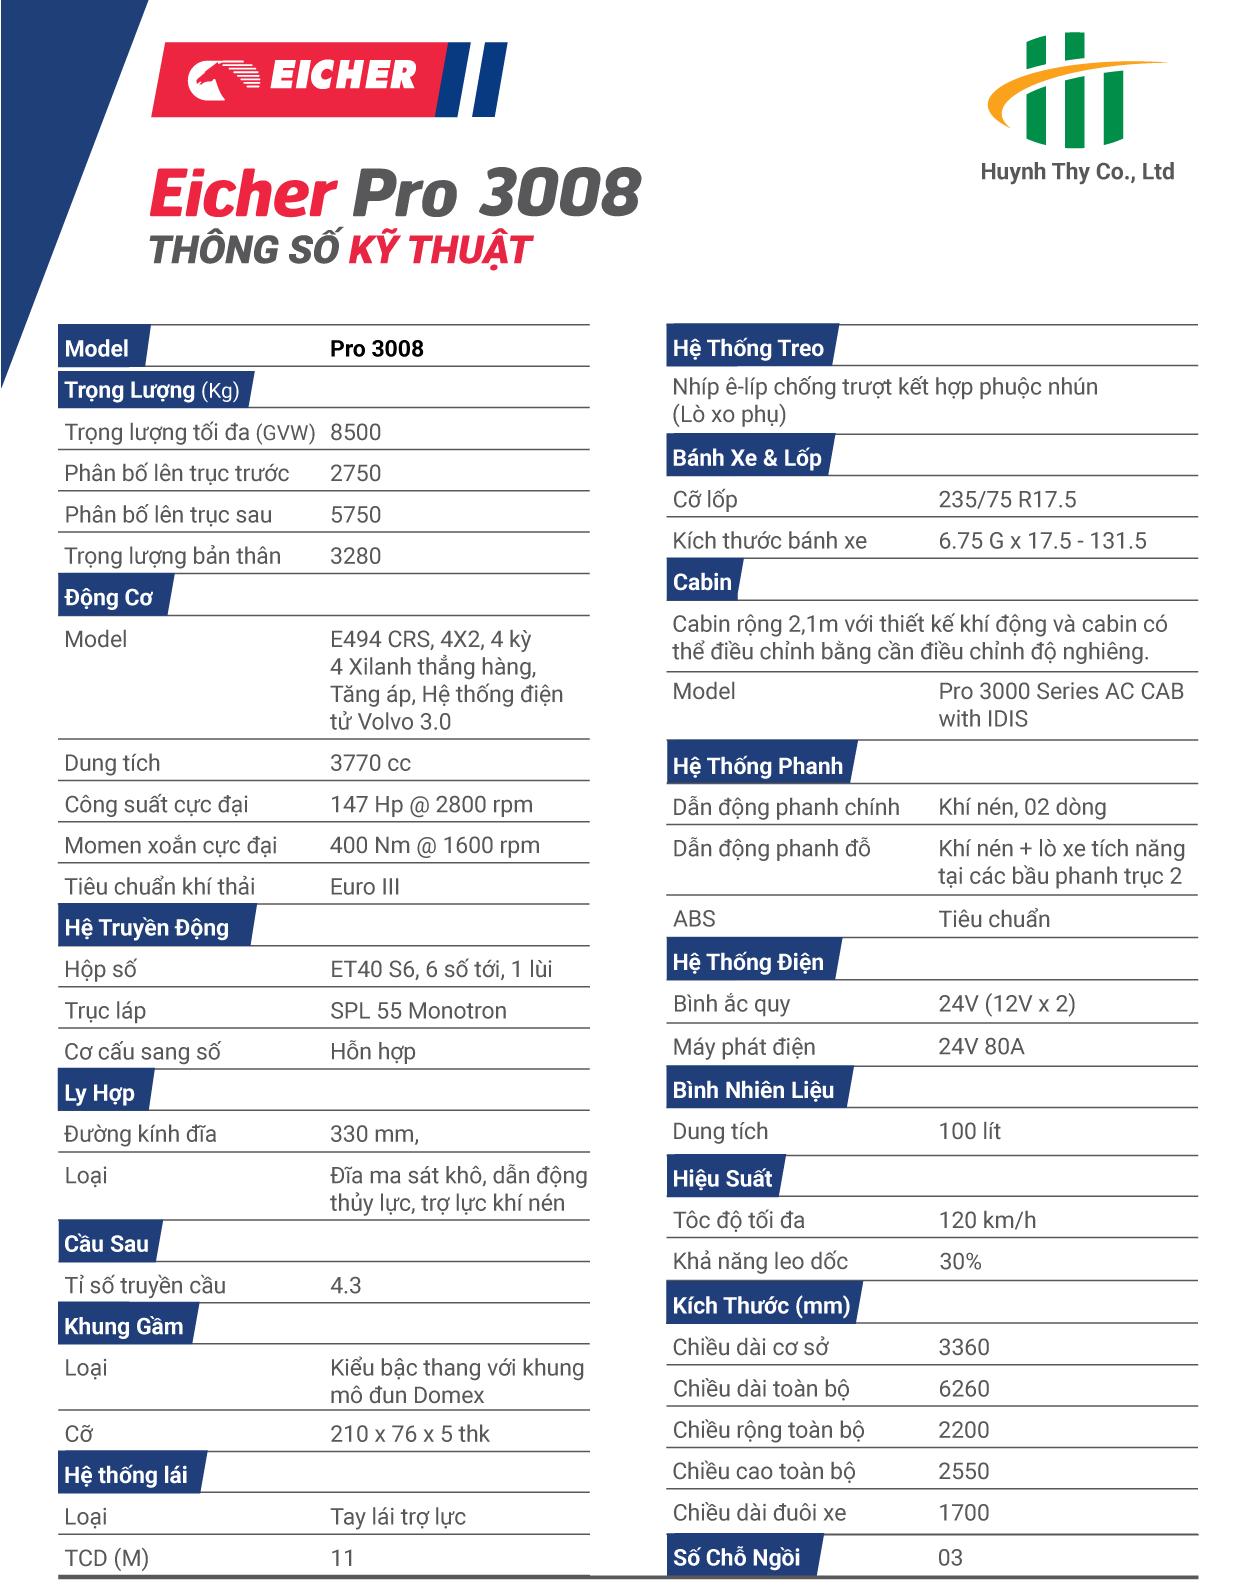 Thong-so-ky-thuat-eicher-pro-3008